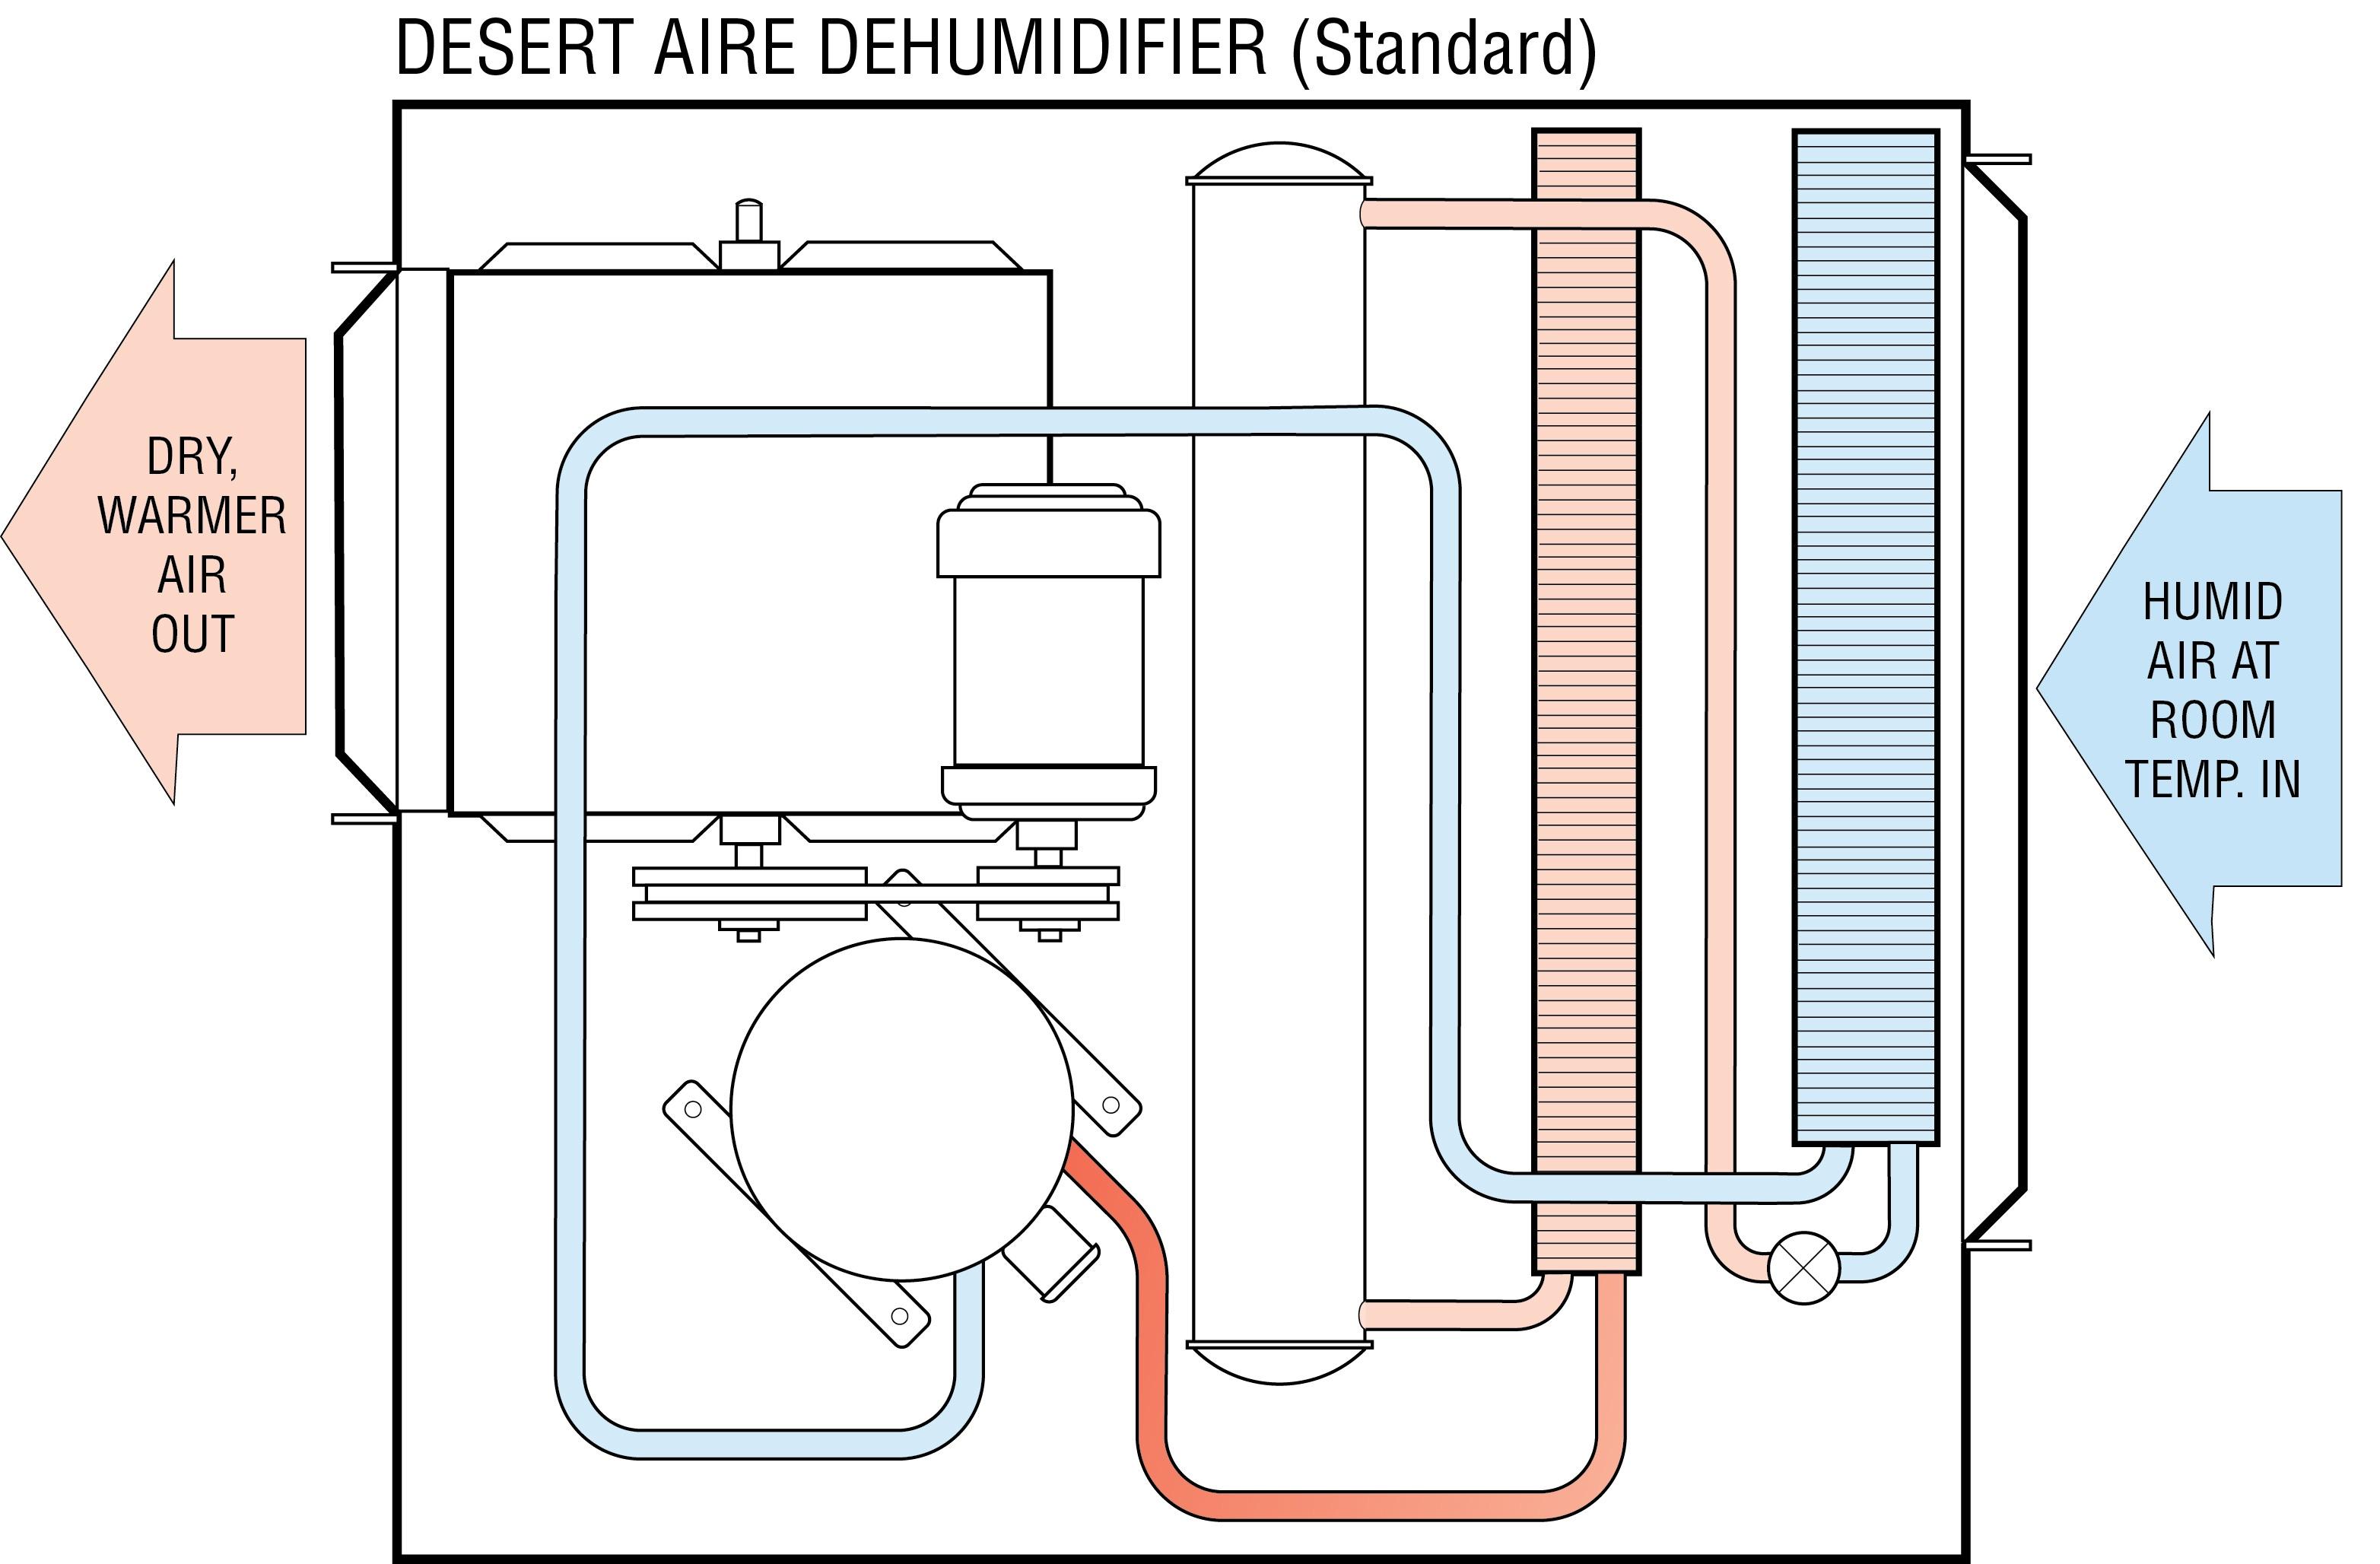 Basic Dehumidification Refrigeration Flow Diagrams